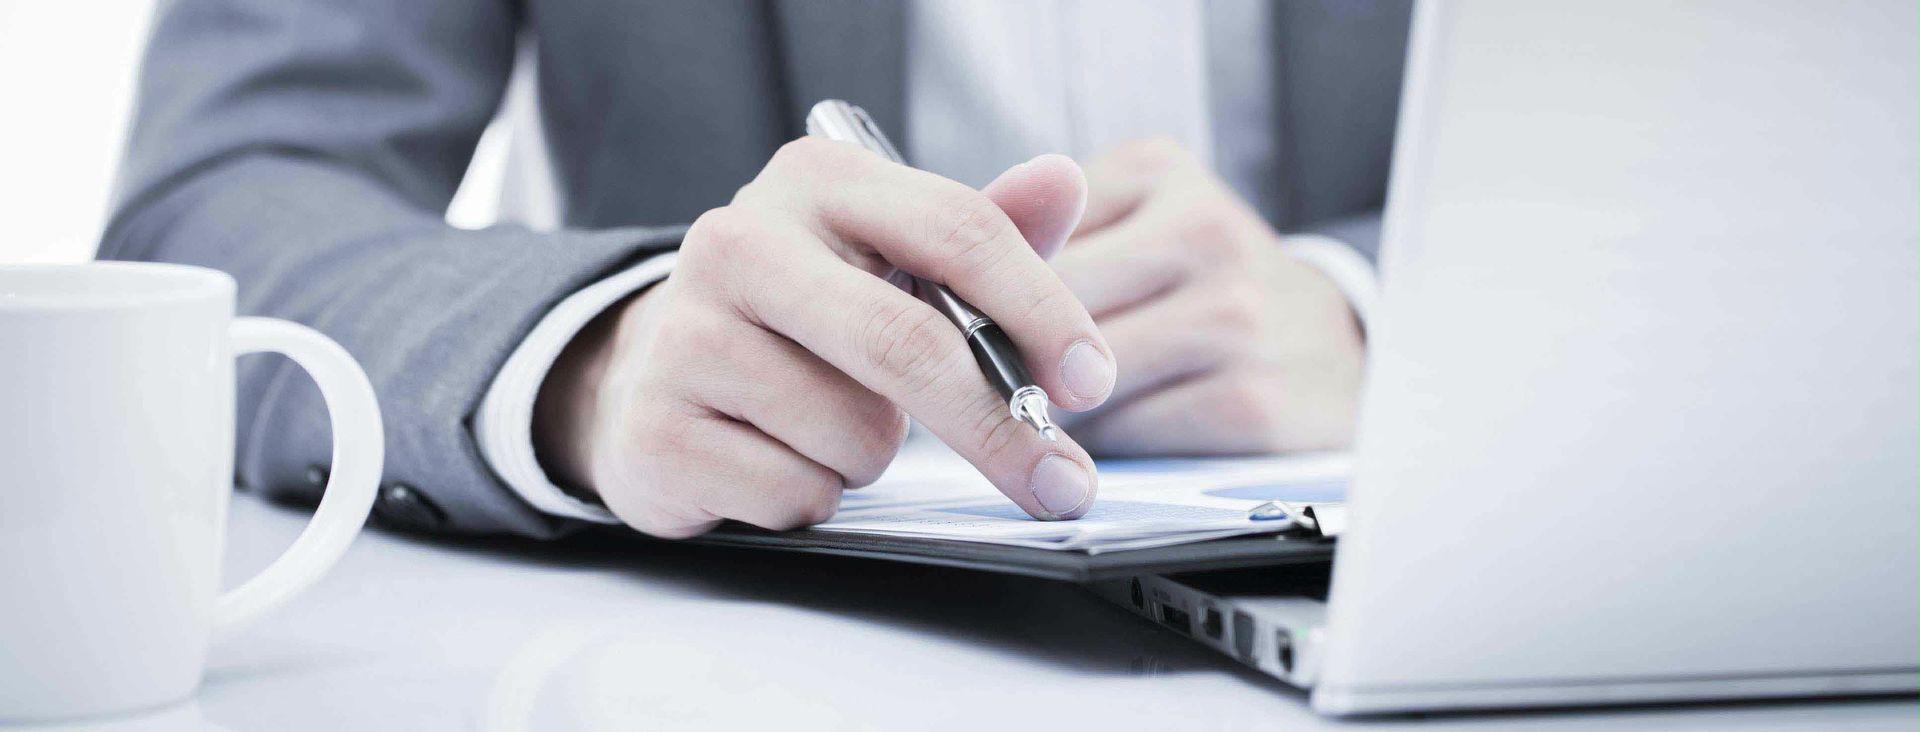 businessmanheader1459x175-finance